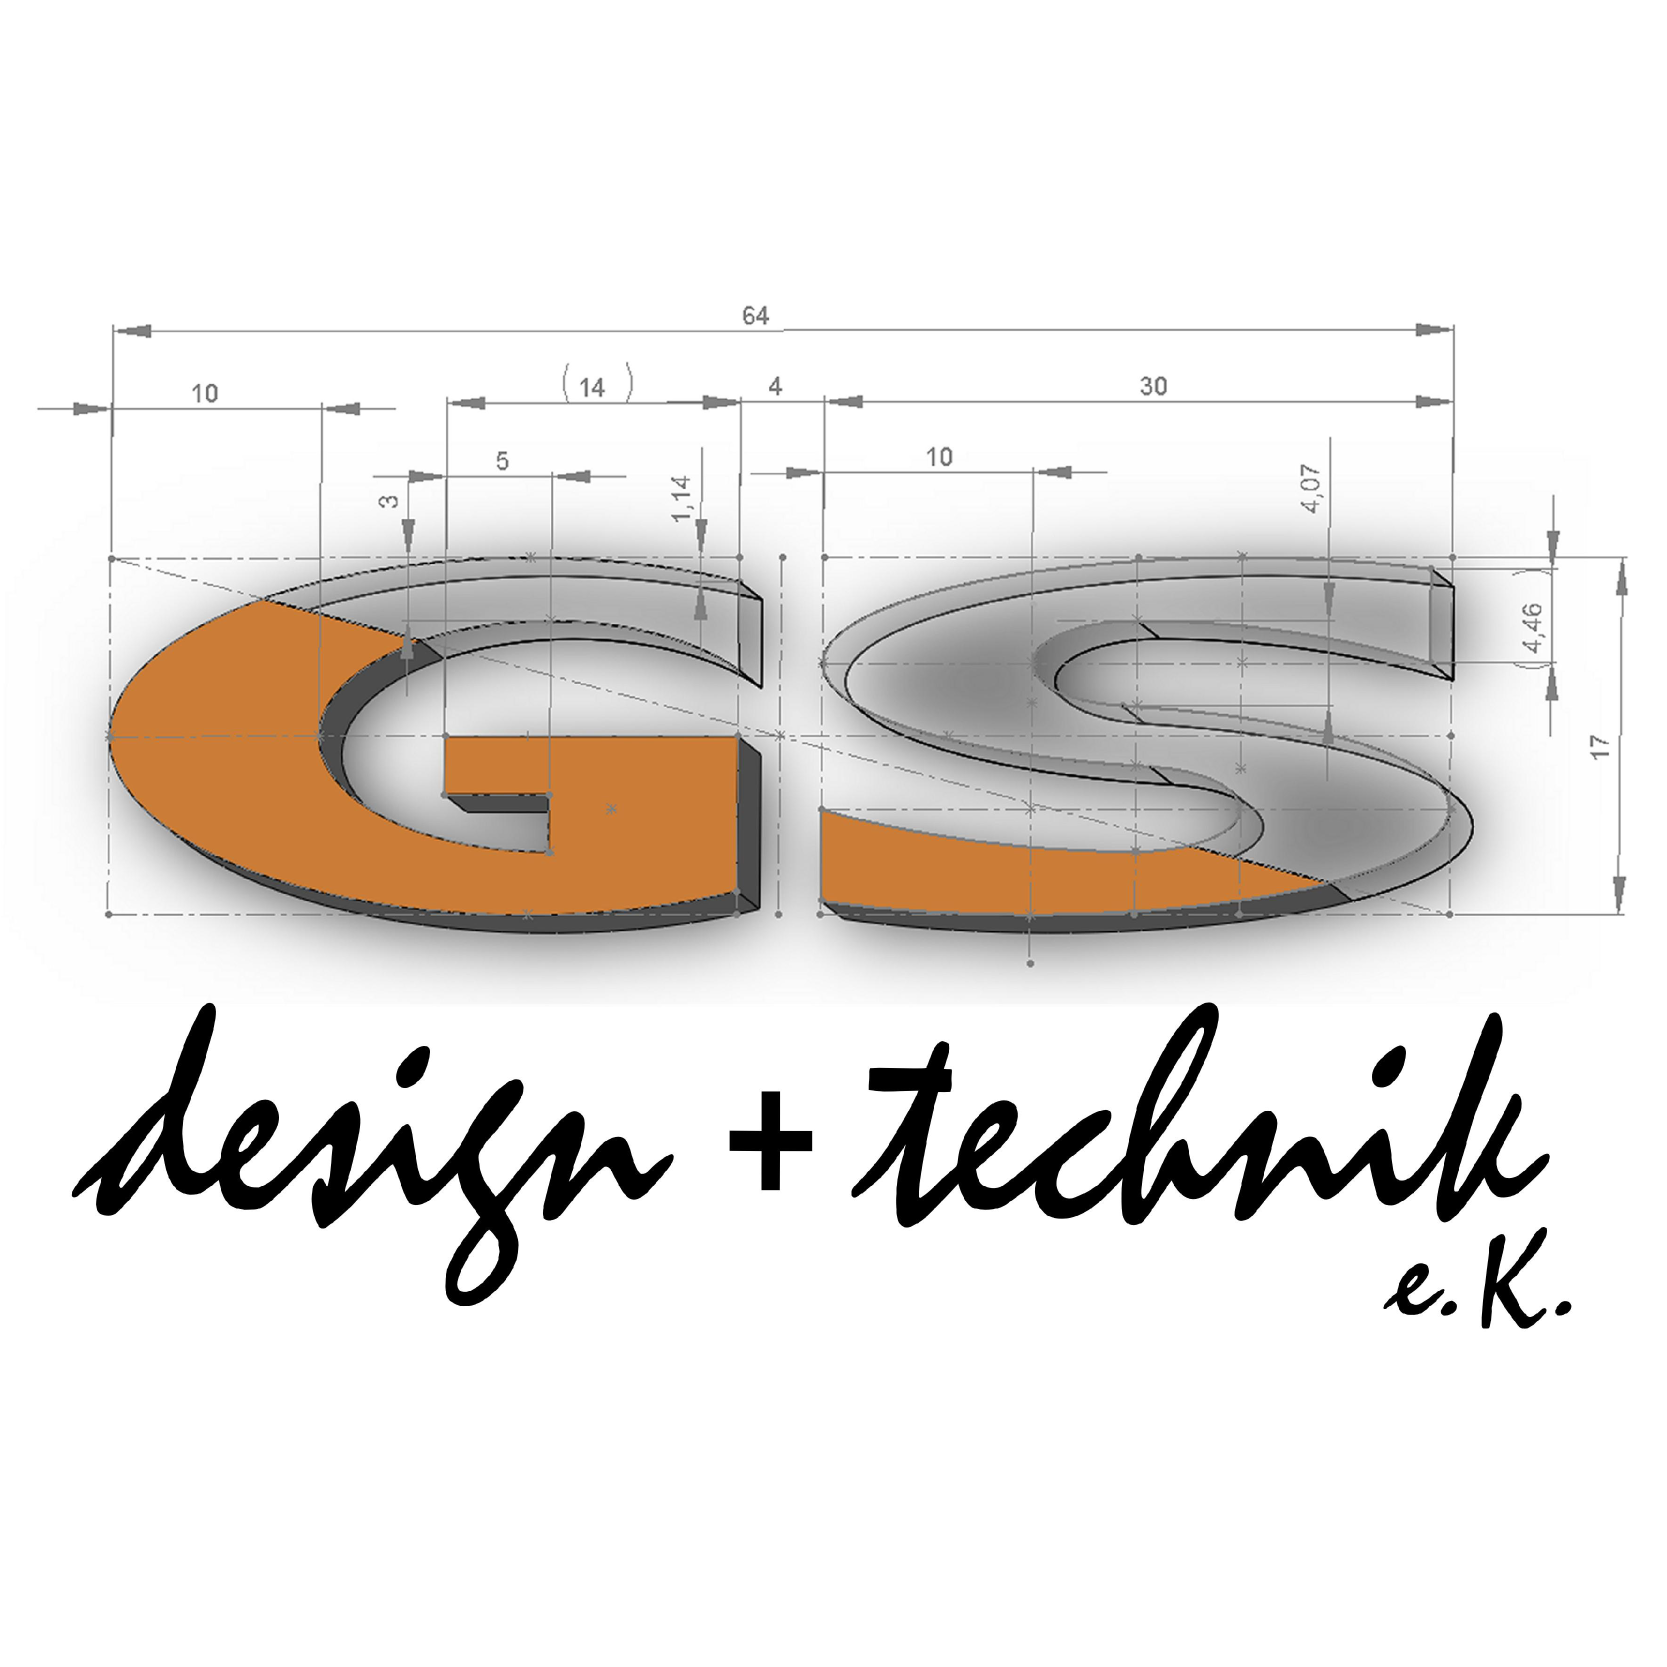 GS design+technik e. K.